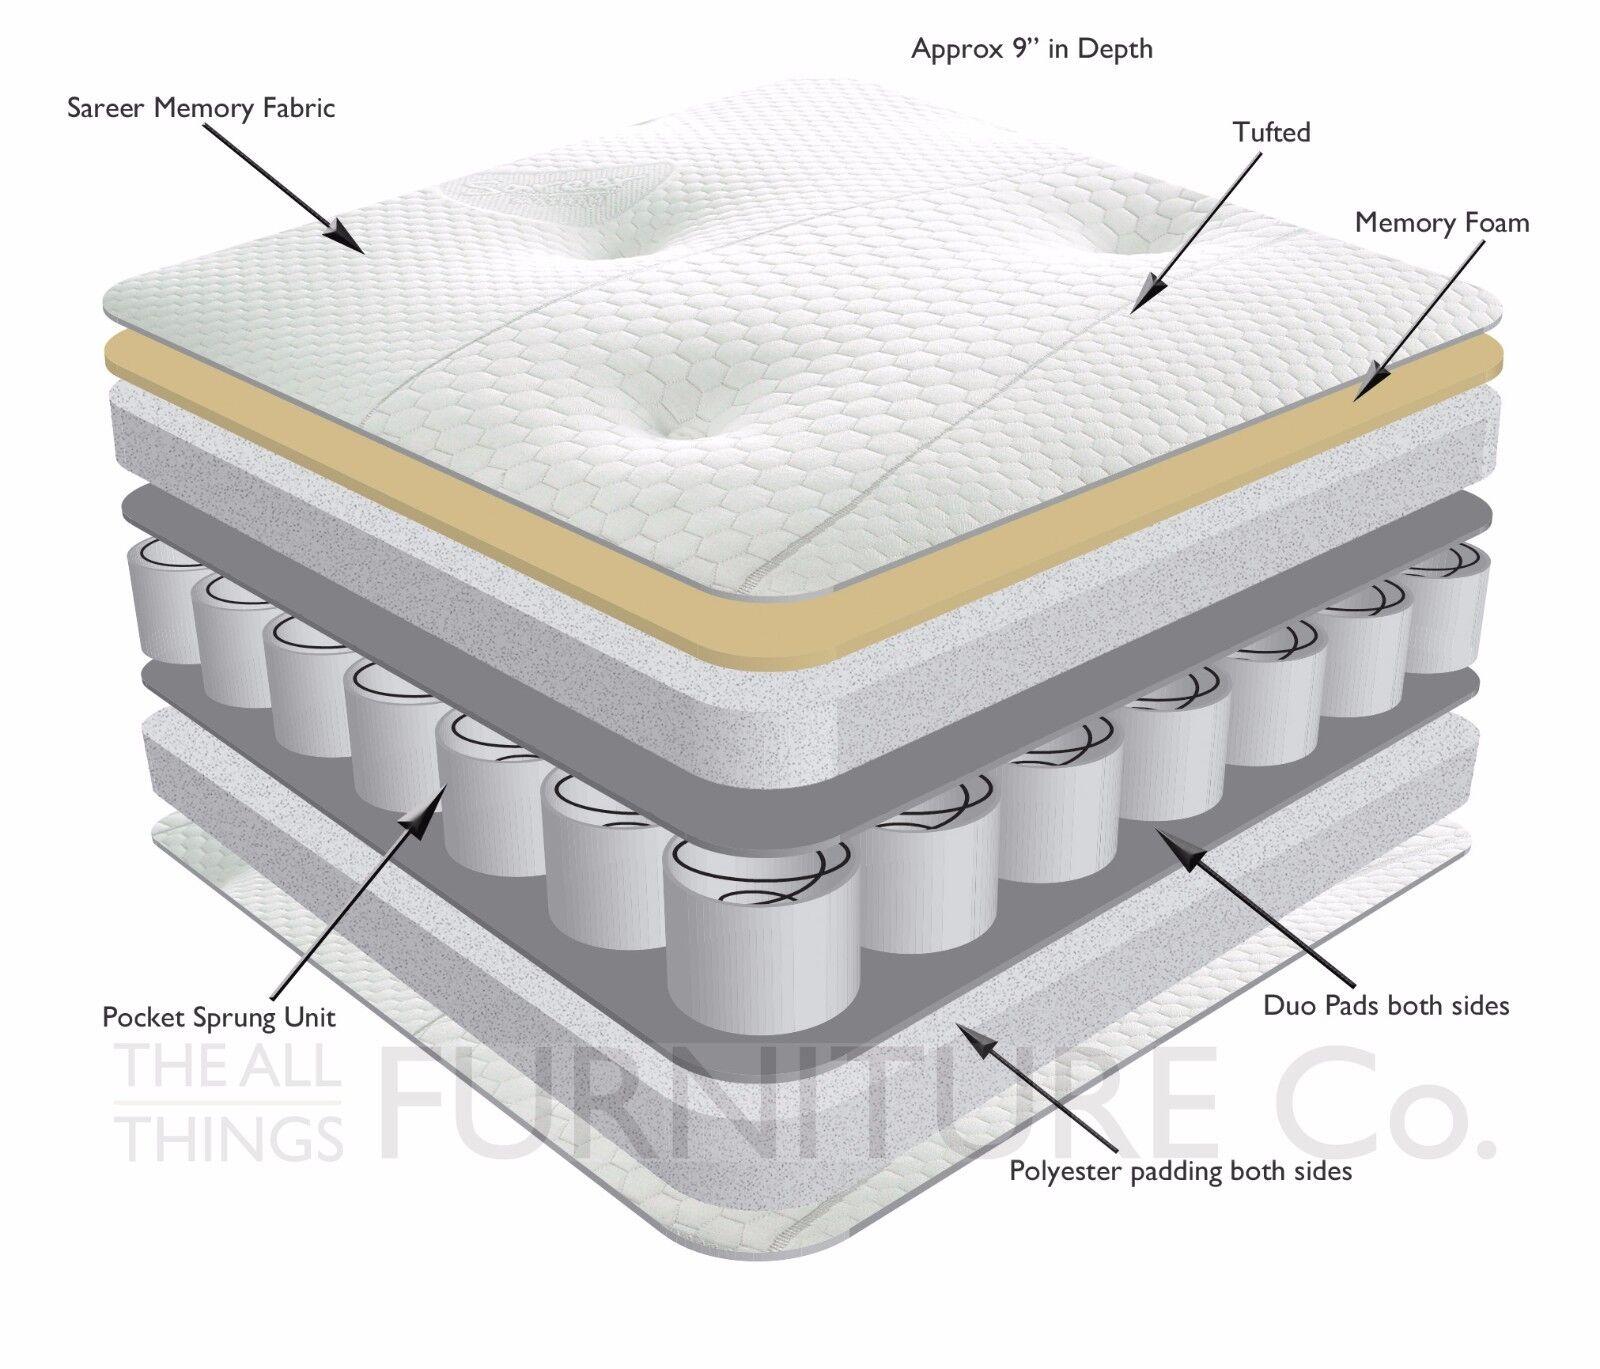 pocket sprung and memory foam mattress inspiration dream house